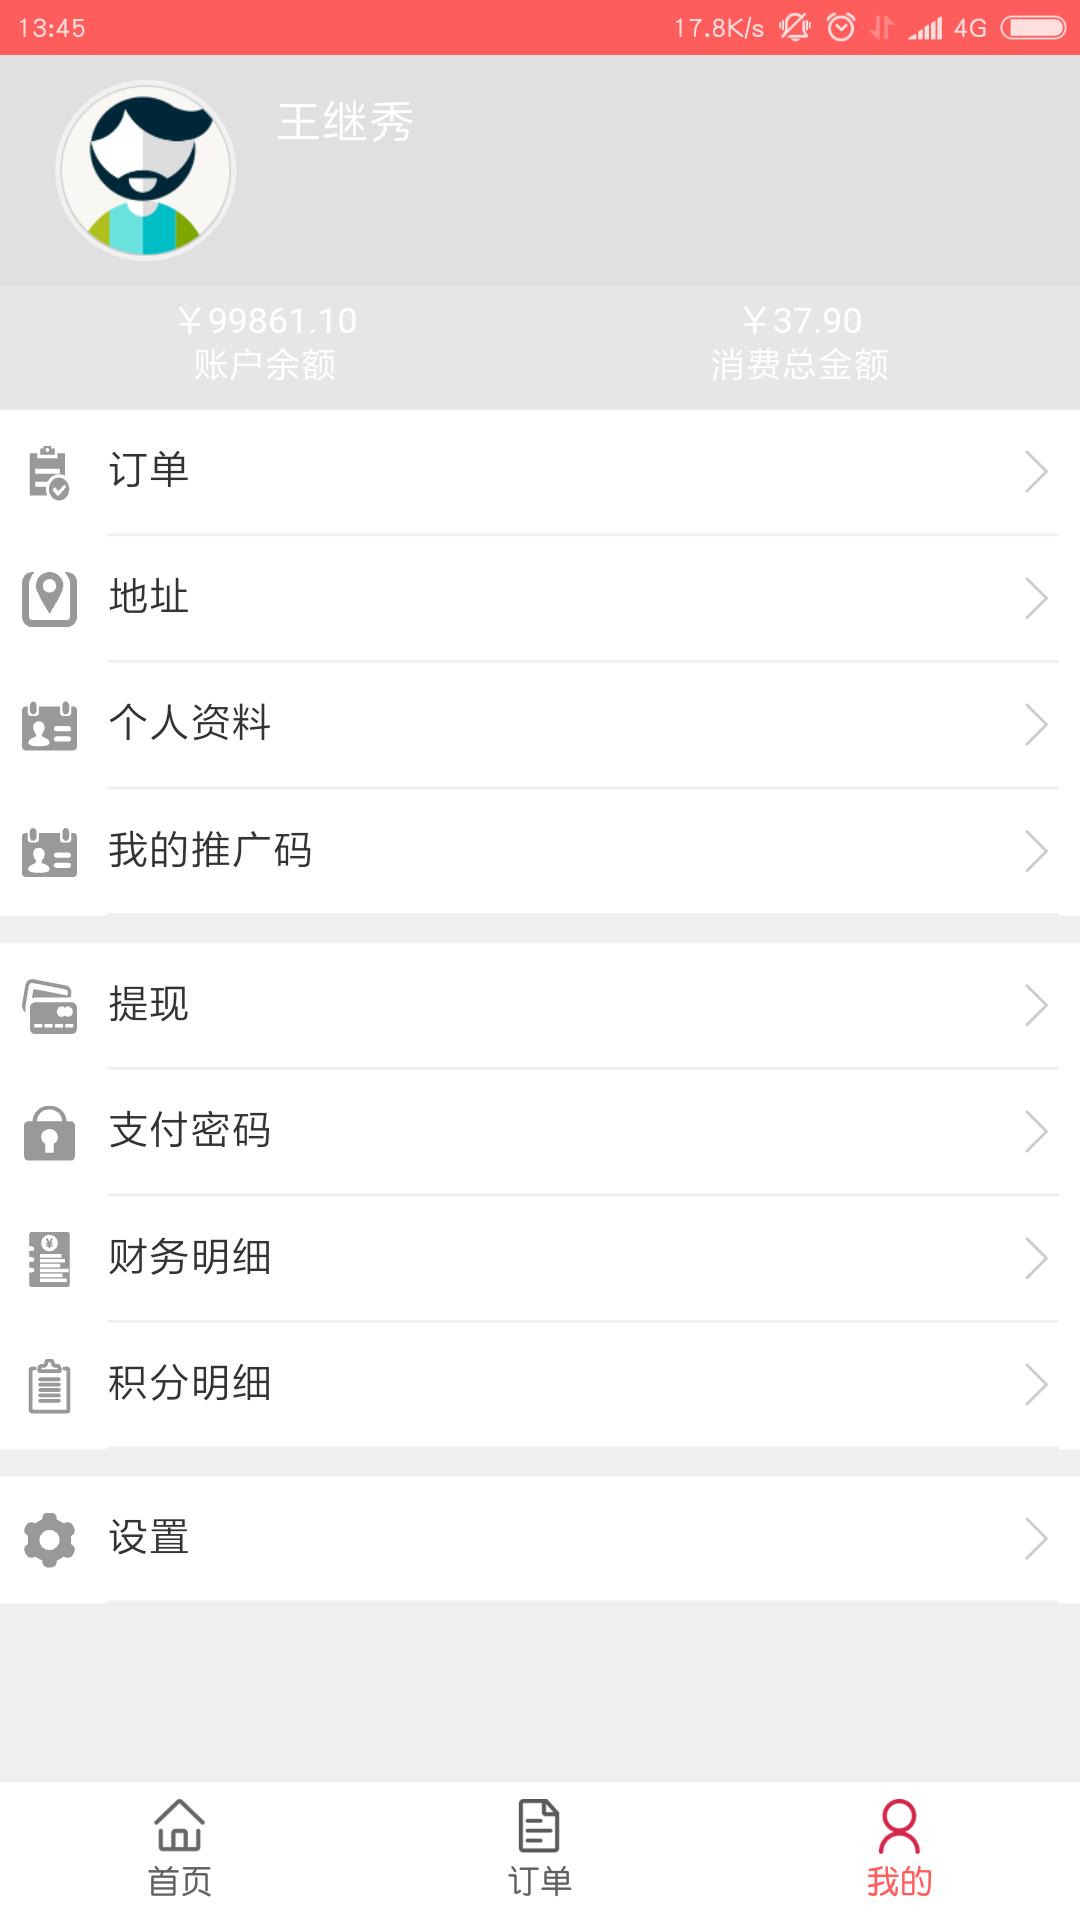 湿声app官方版  v1.0.0图3